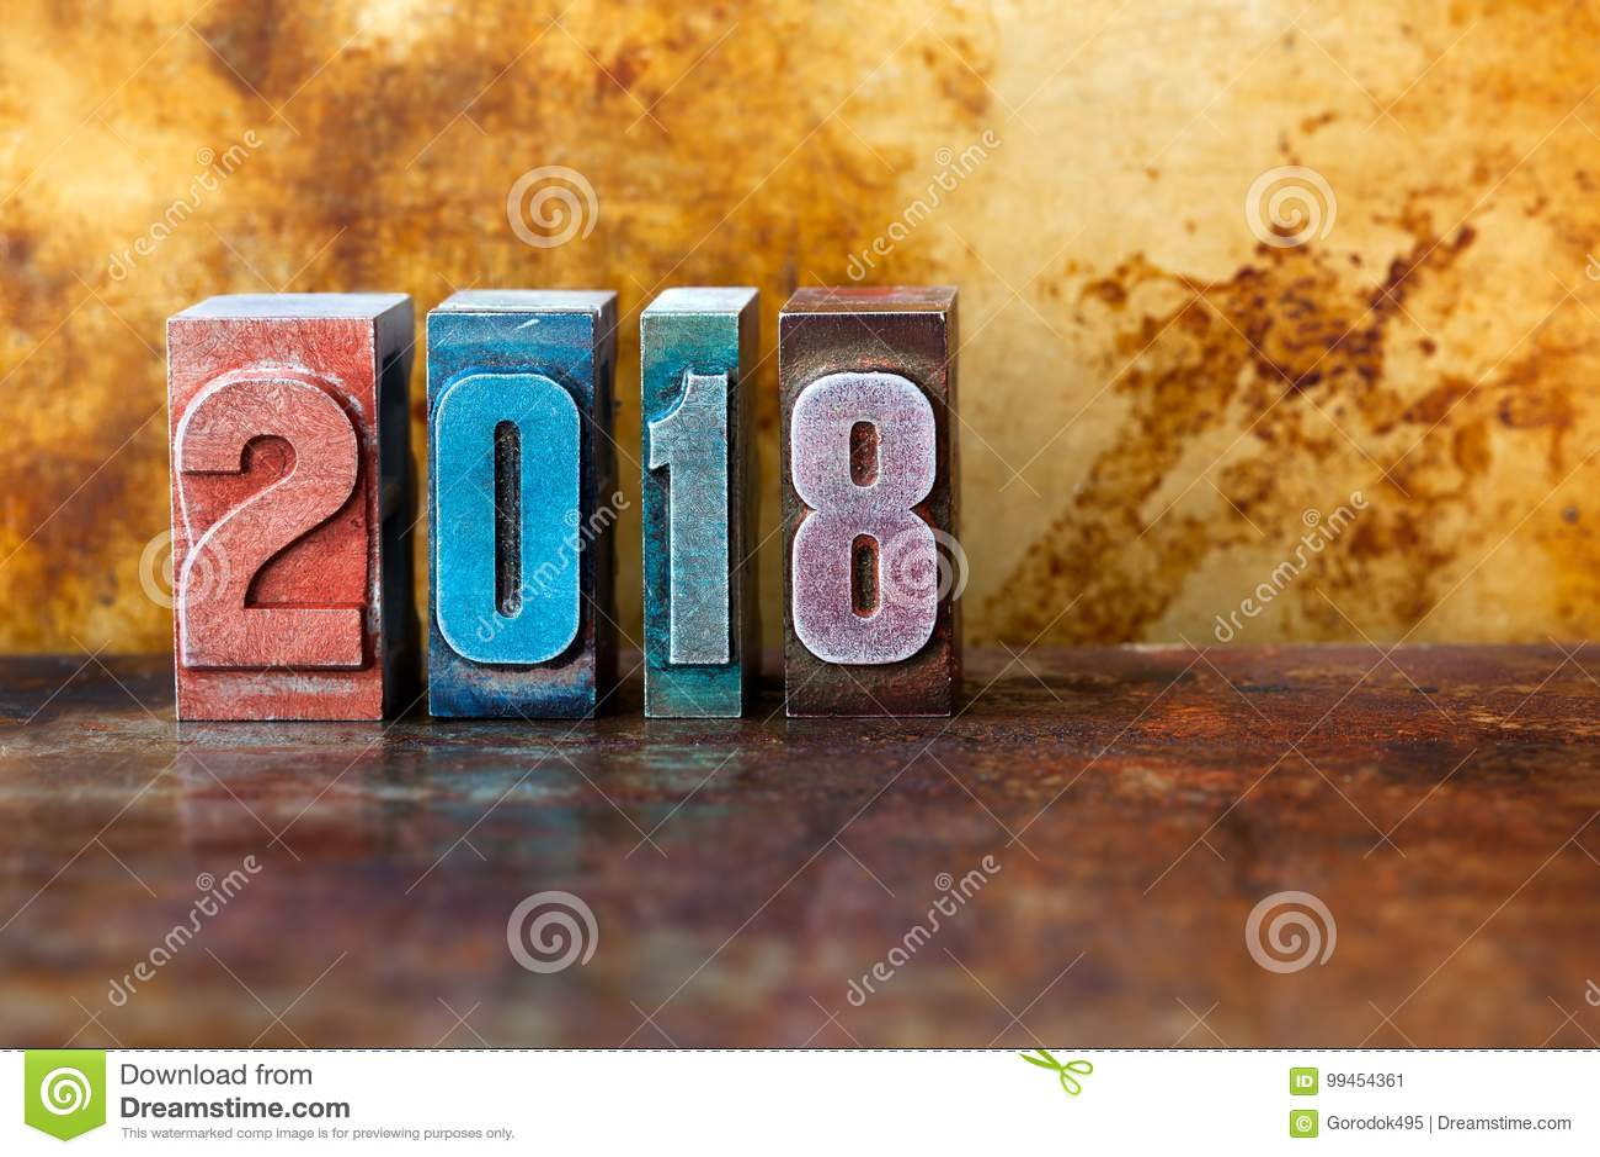 2018 happy new year postcard. Colorful letterpress digits symbol winter holidays. Creative retro style design xmas